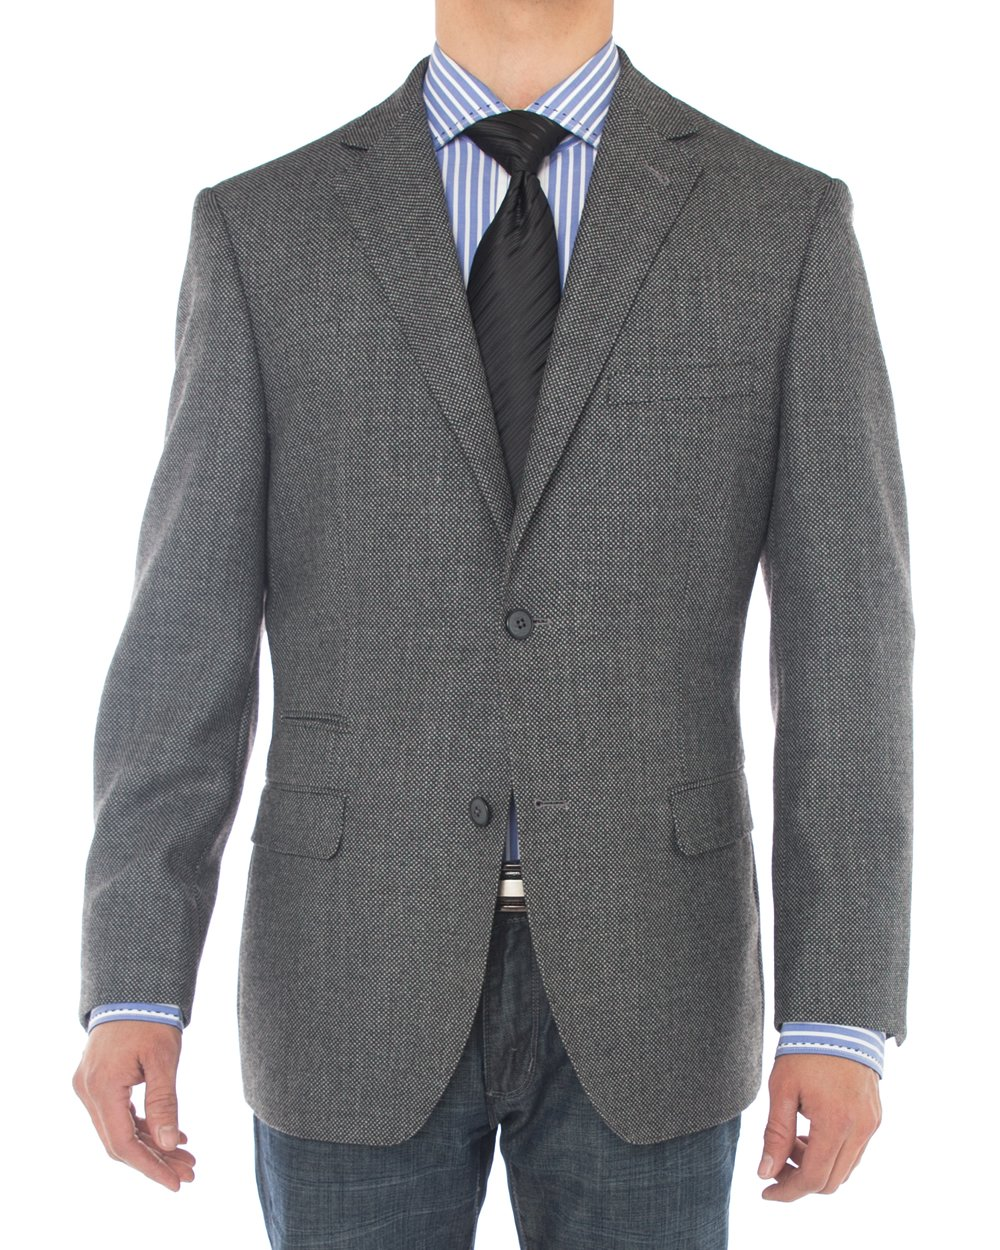 Luciano Natazzi Mens 2 Button 160'S Wool Blazer Working Button Holes Suit Jacket (44 Regular US / 54 Regular EU, Charcoal)